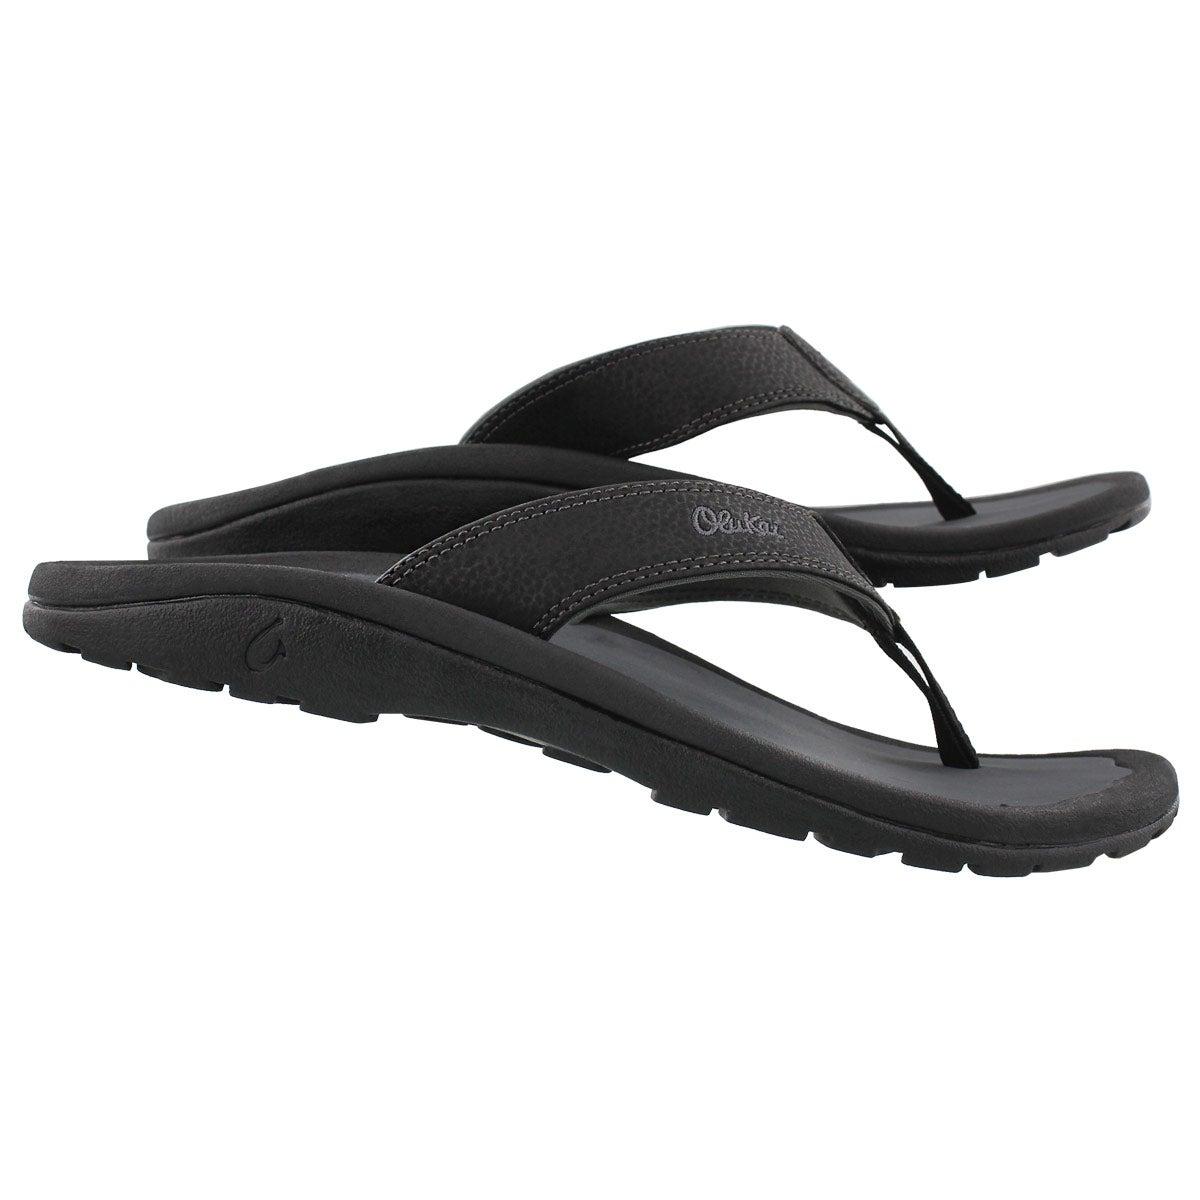 Mns Ohana blk/shadow thong sandal